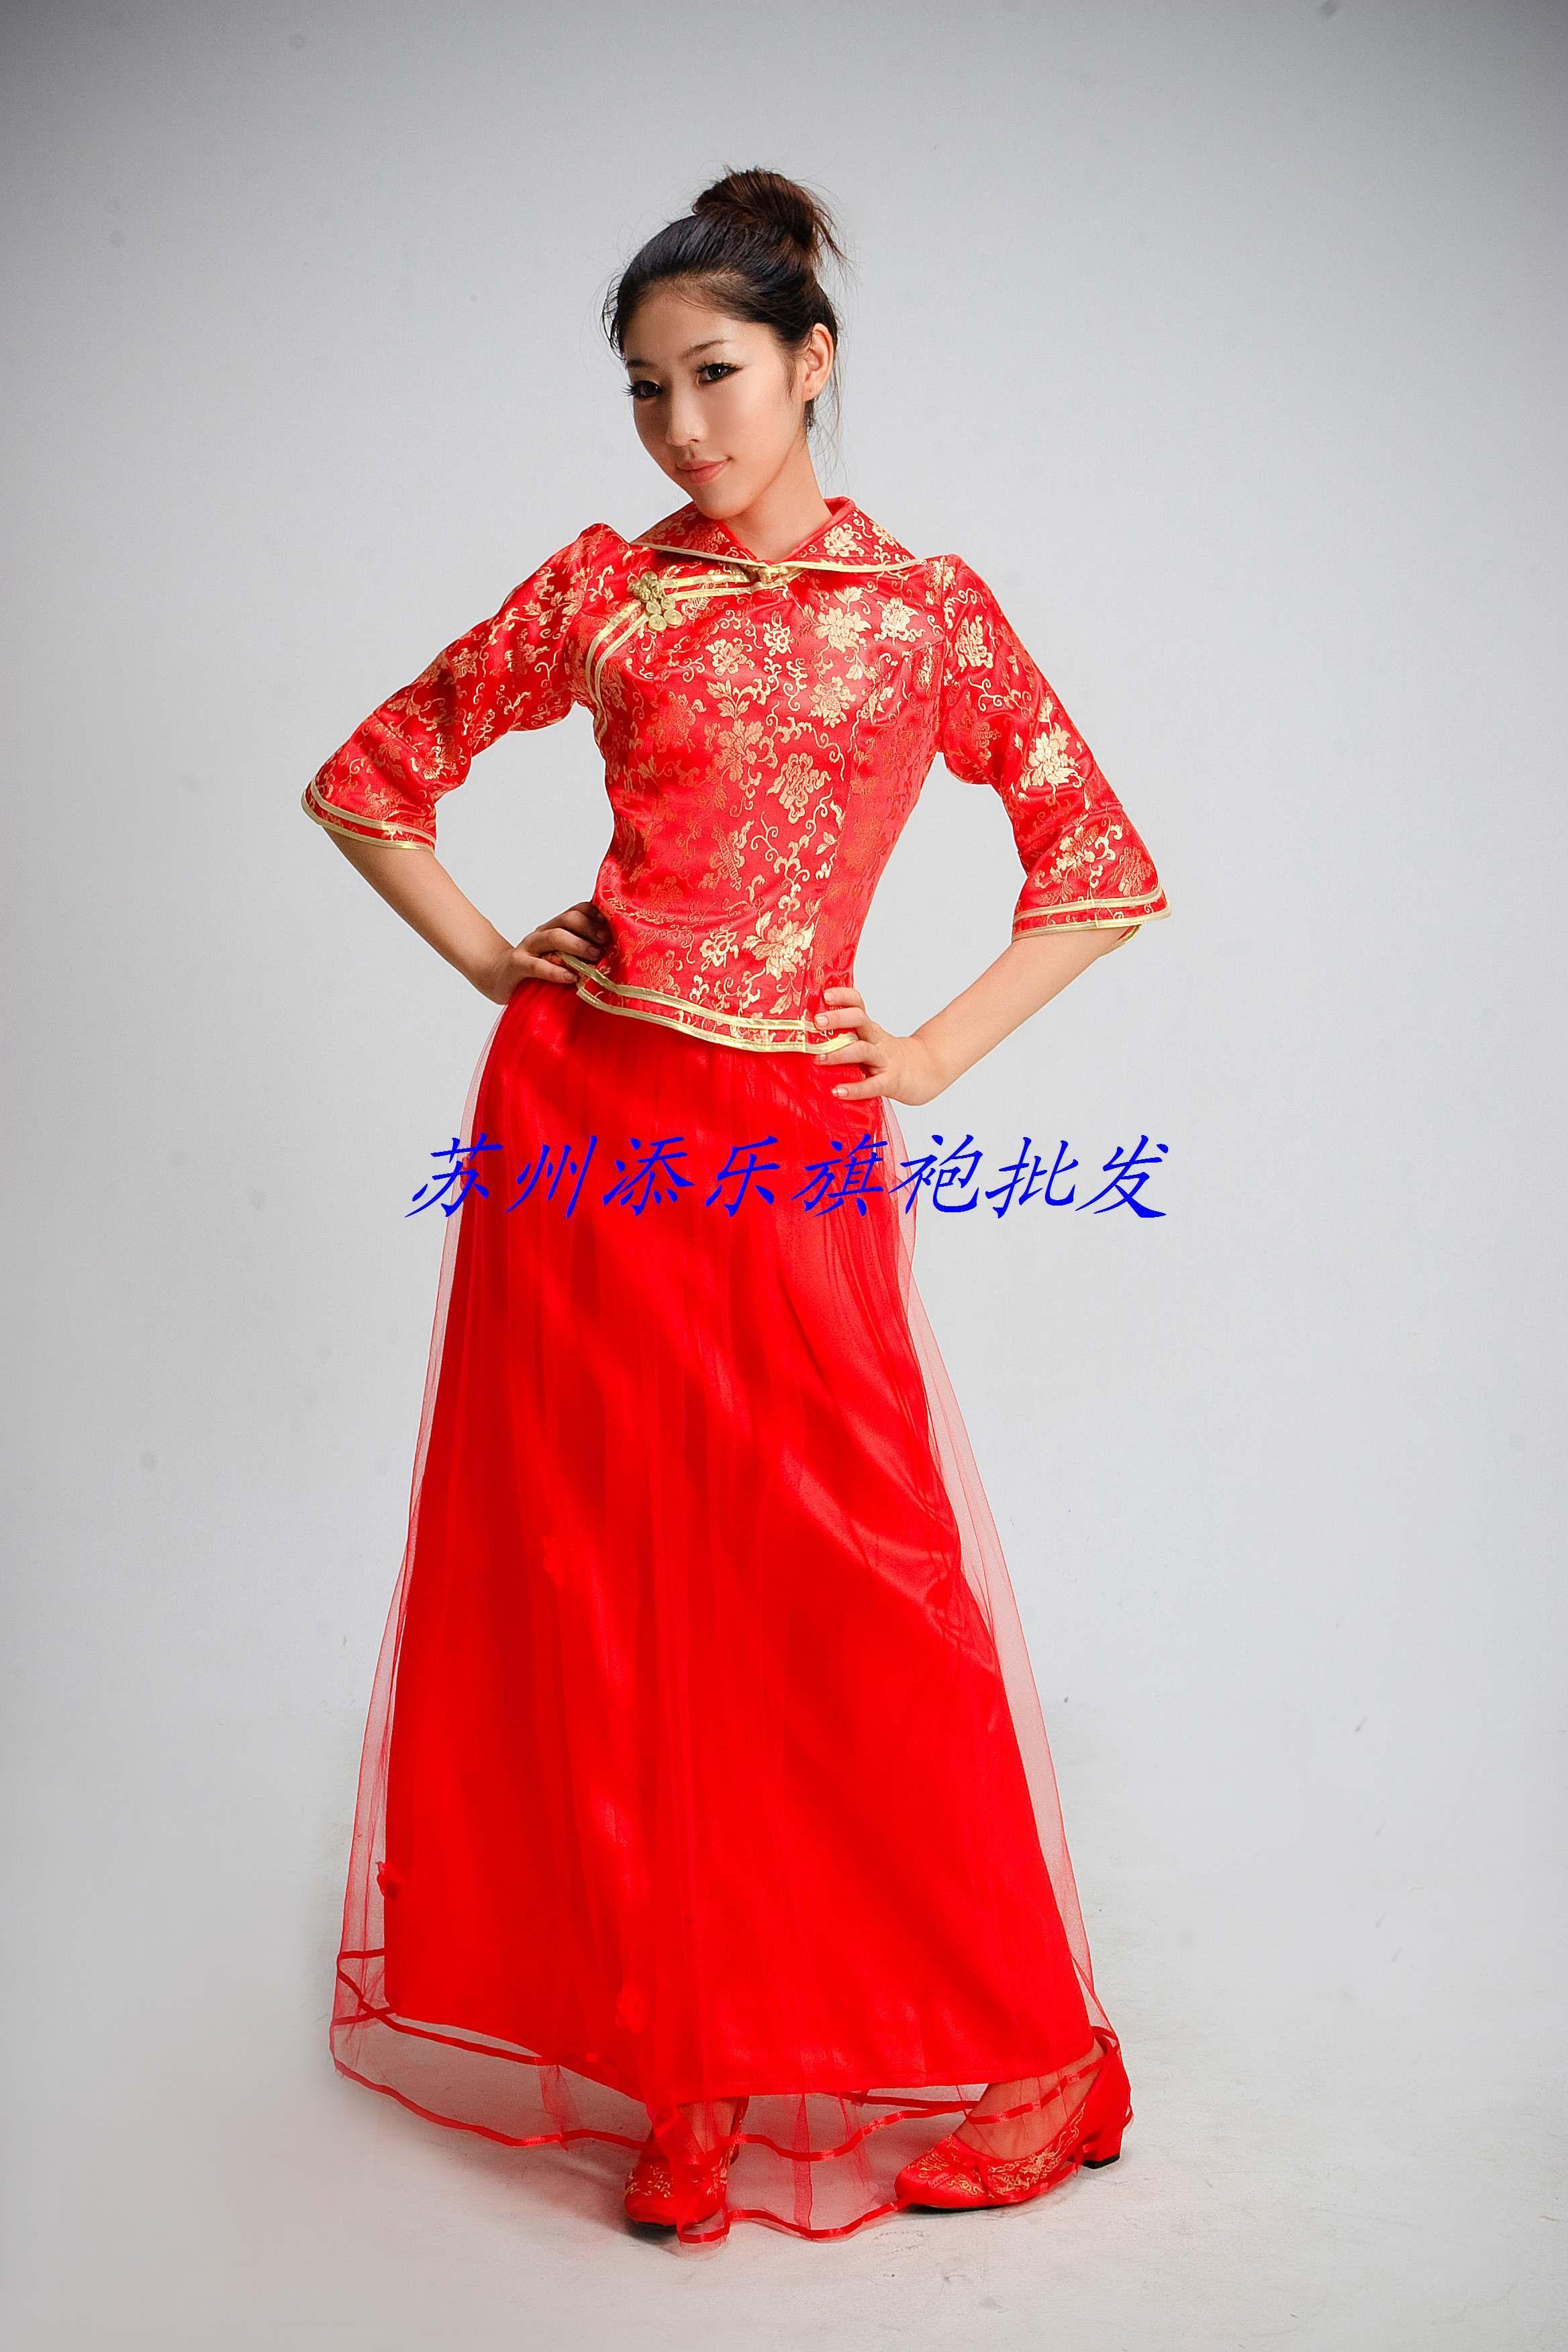 Платье Ципао Shili Shantang zj017 75